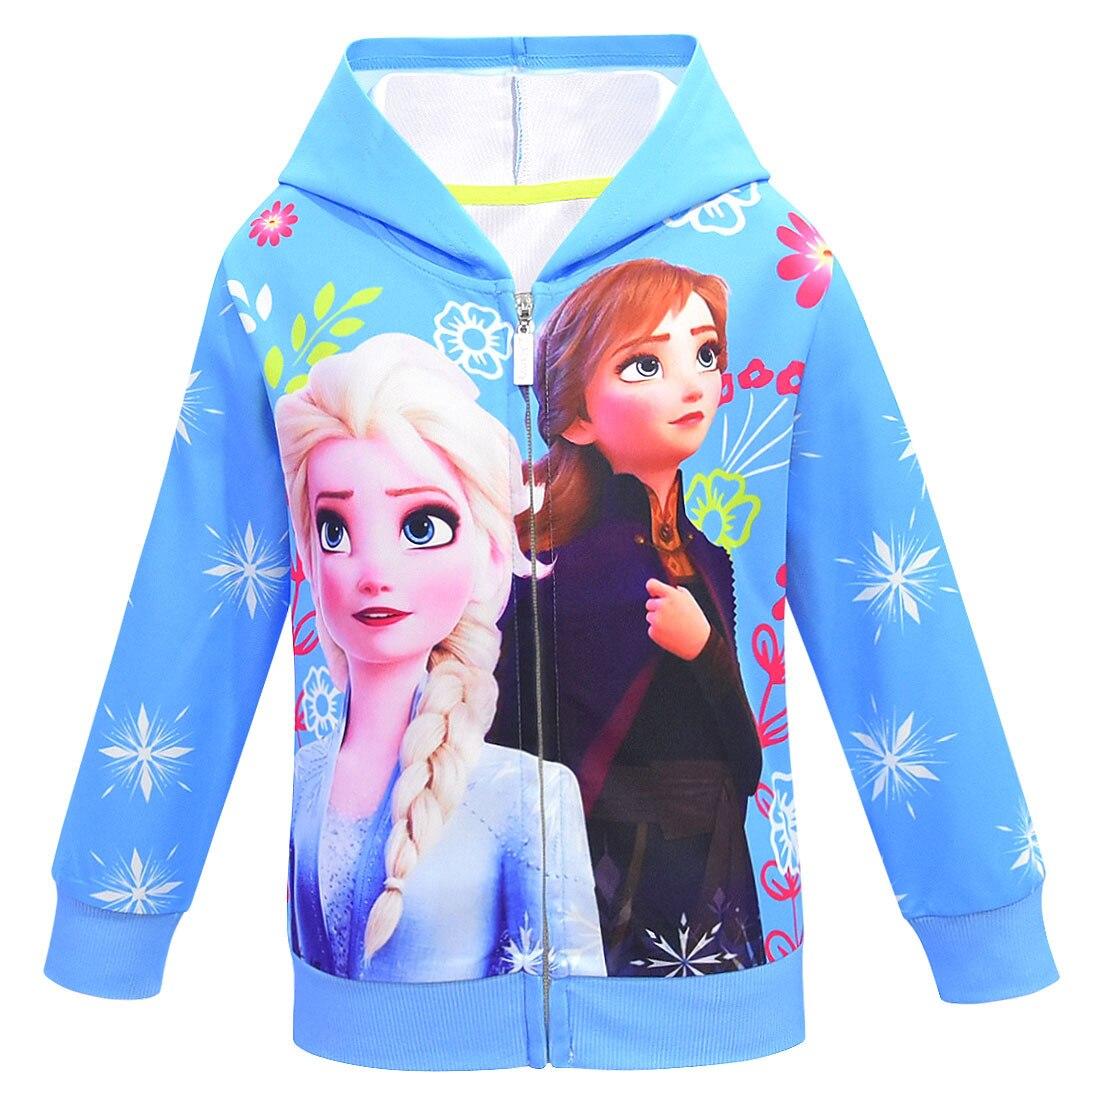 Anna Olaf imprimir niñas con capucha prendas de vestir exteriores traje 2020 nuevo primavera lindo niños de manga larga Cardigan abrigo y chaqueta E29K47